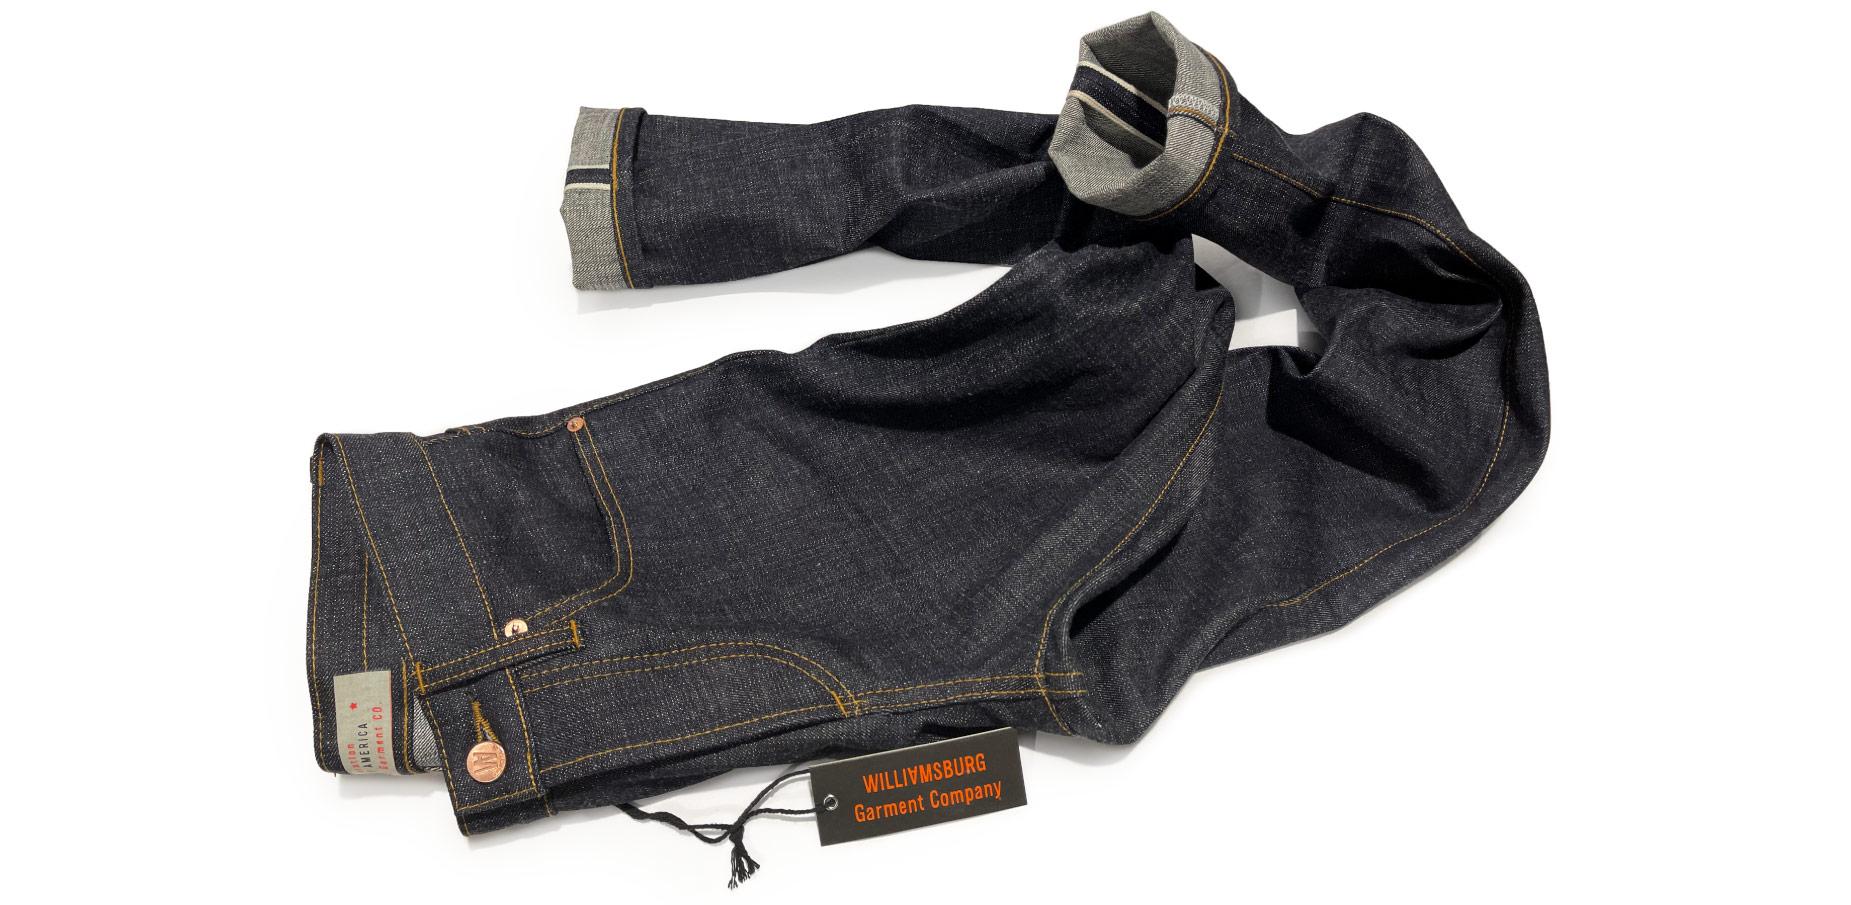 Selvedge 15 oz heavyweight rigid 100 % cotton jeans no stretch women's raw denim jeans custom made in Brooklyn, New York, USA